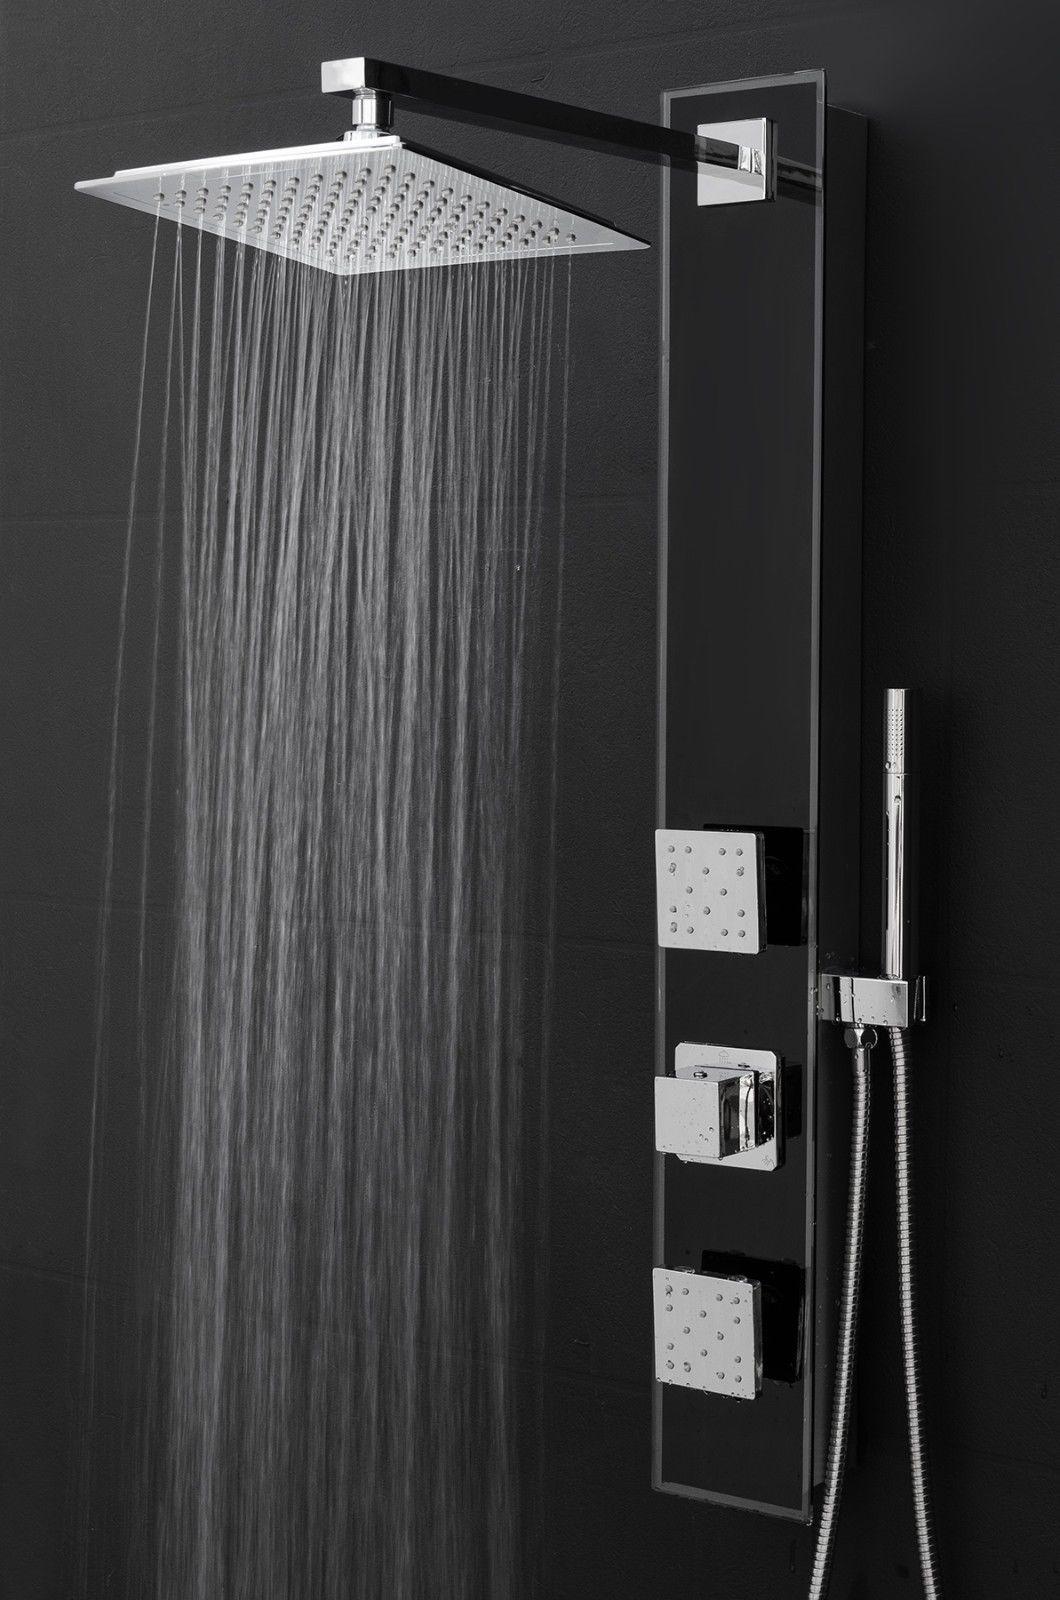 Stainless Steel Shower Panels | Massage Shower Panel